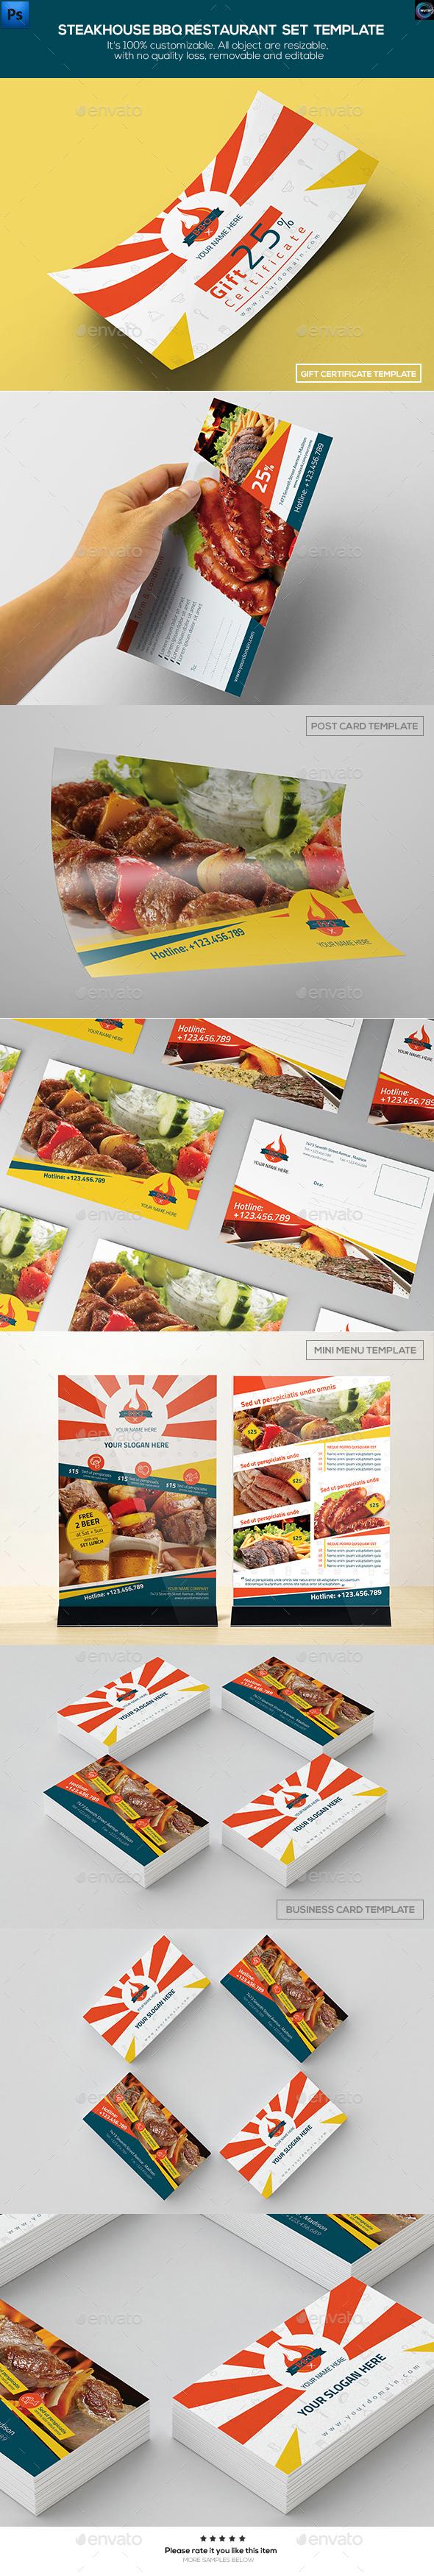 Steakhouse BBQ Restaurant - Set Template - Food Menus Print Templates